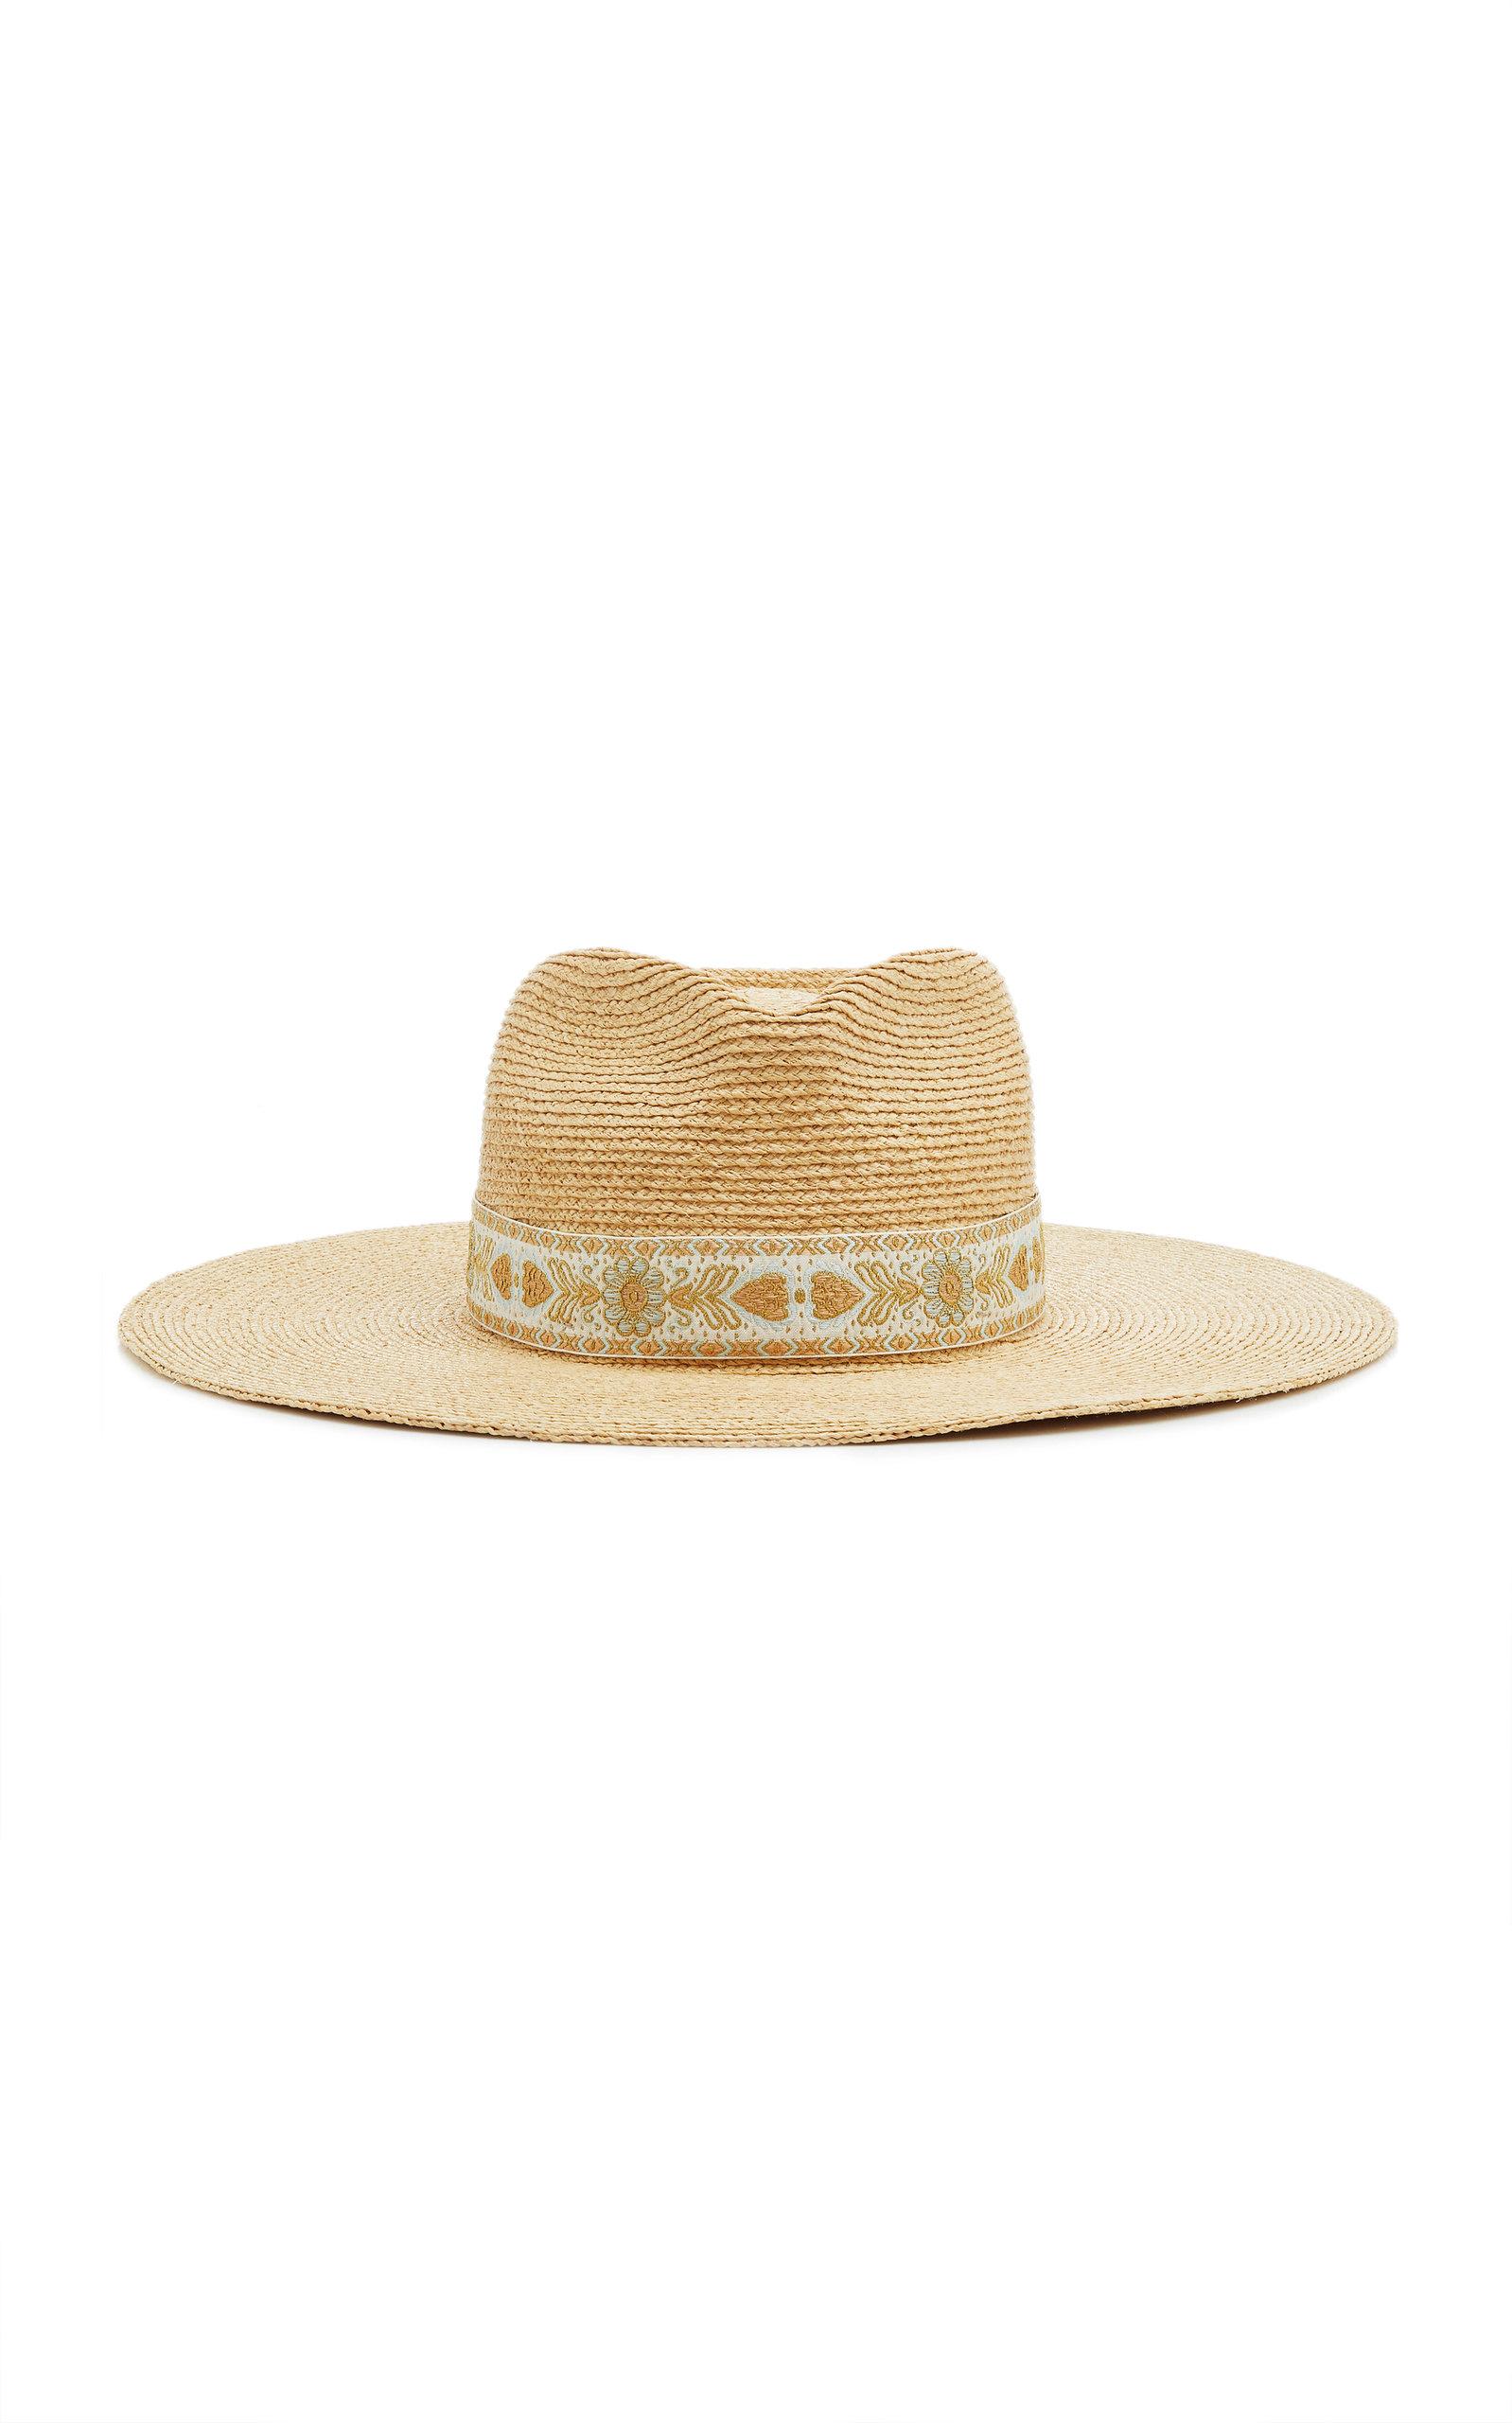 Women's The Indio Special Raffia Hat